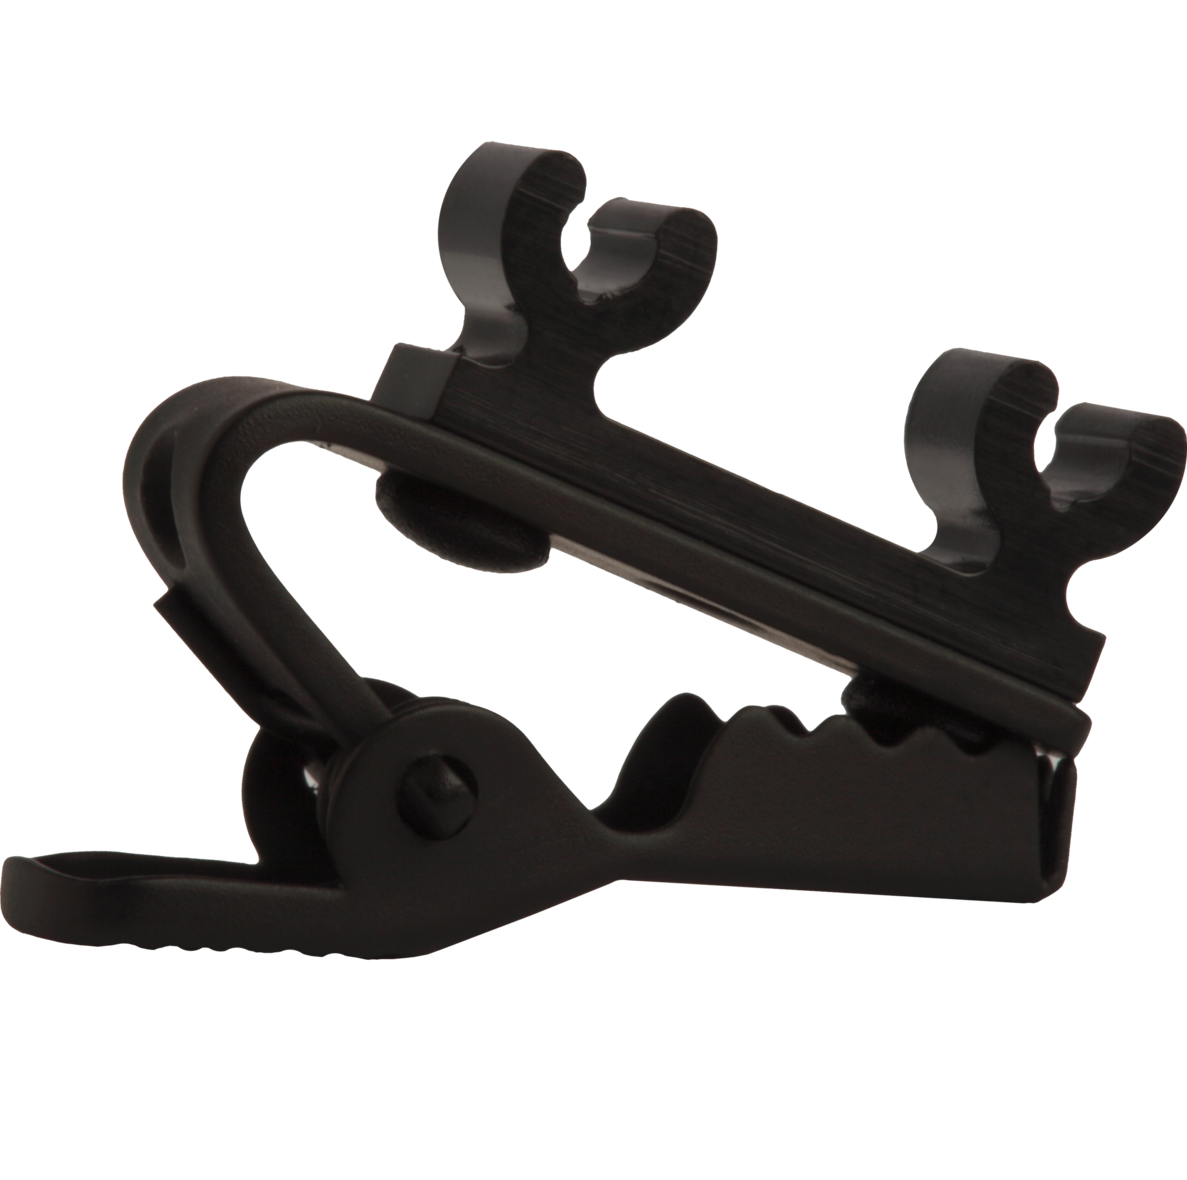 Shure Part - Dual Tie Clip for WL93